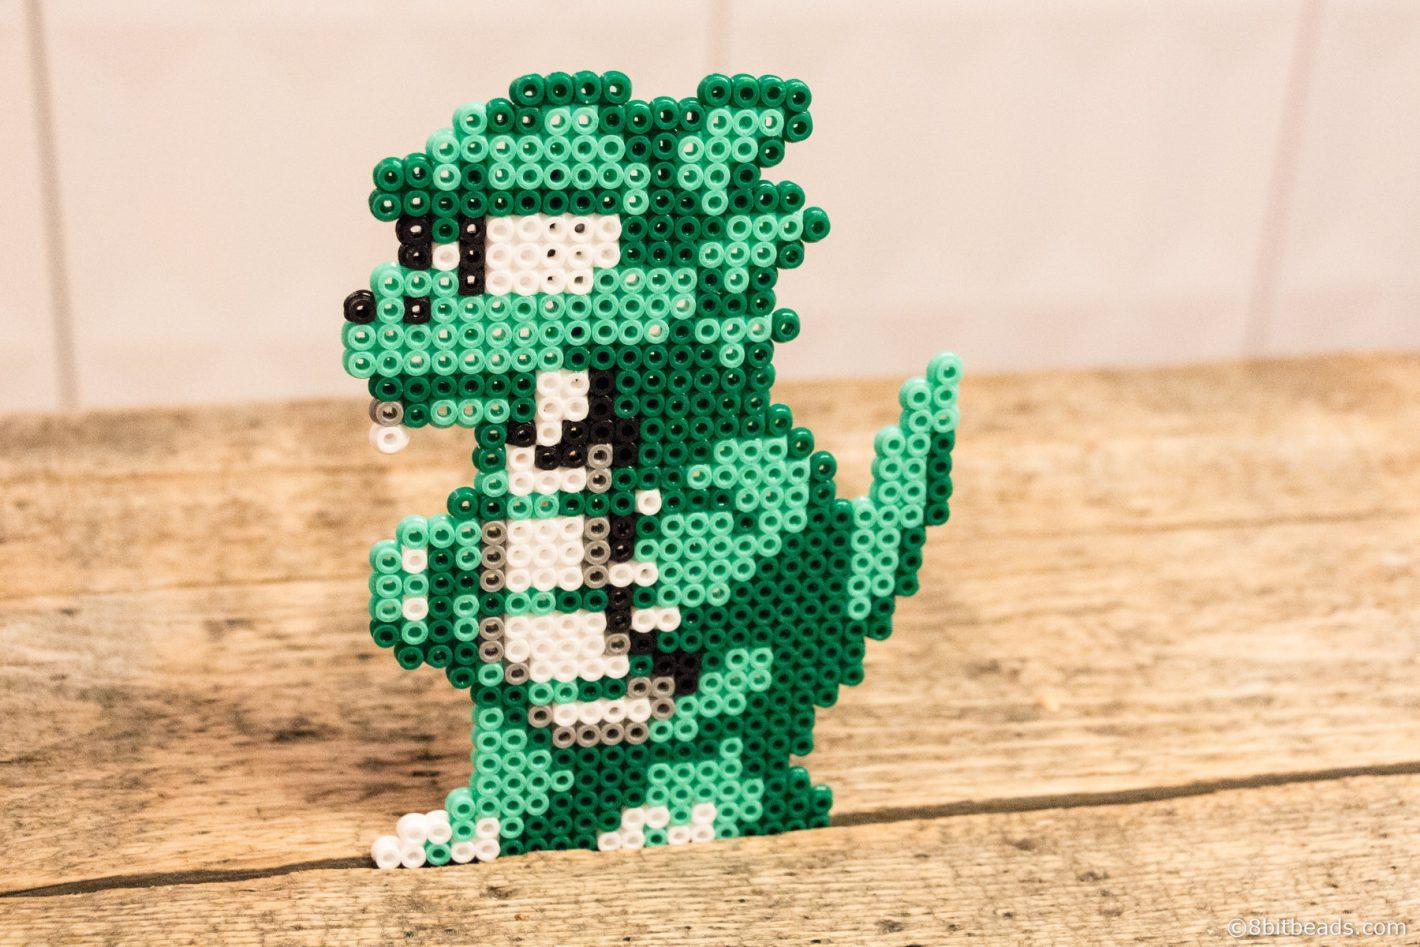 Lizard Man Wonderboy - 8bitbeads.com